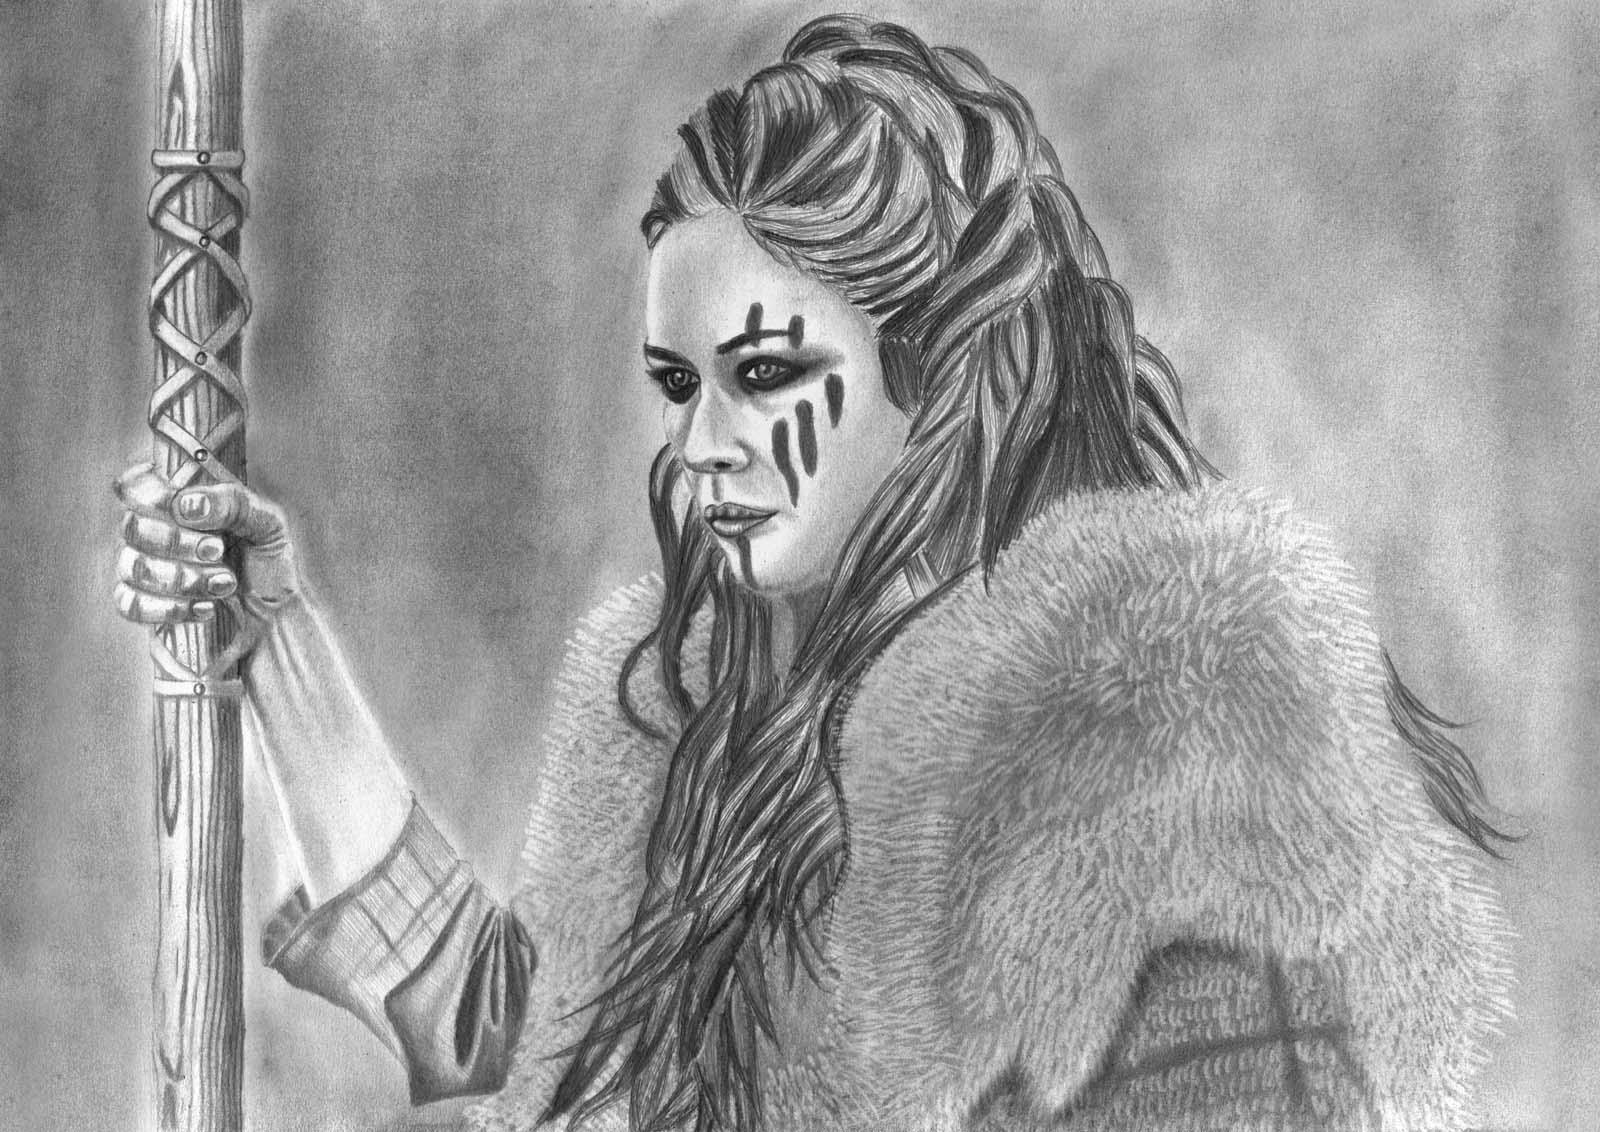 Olga Kurylenko Etain Centurion [She Wolf] by diablocyrus